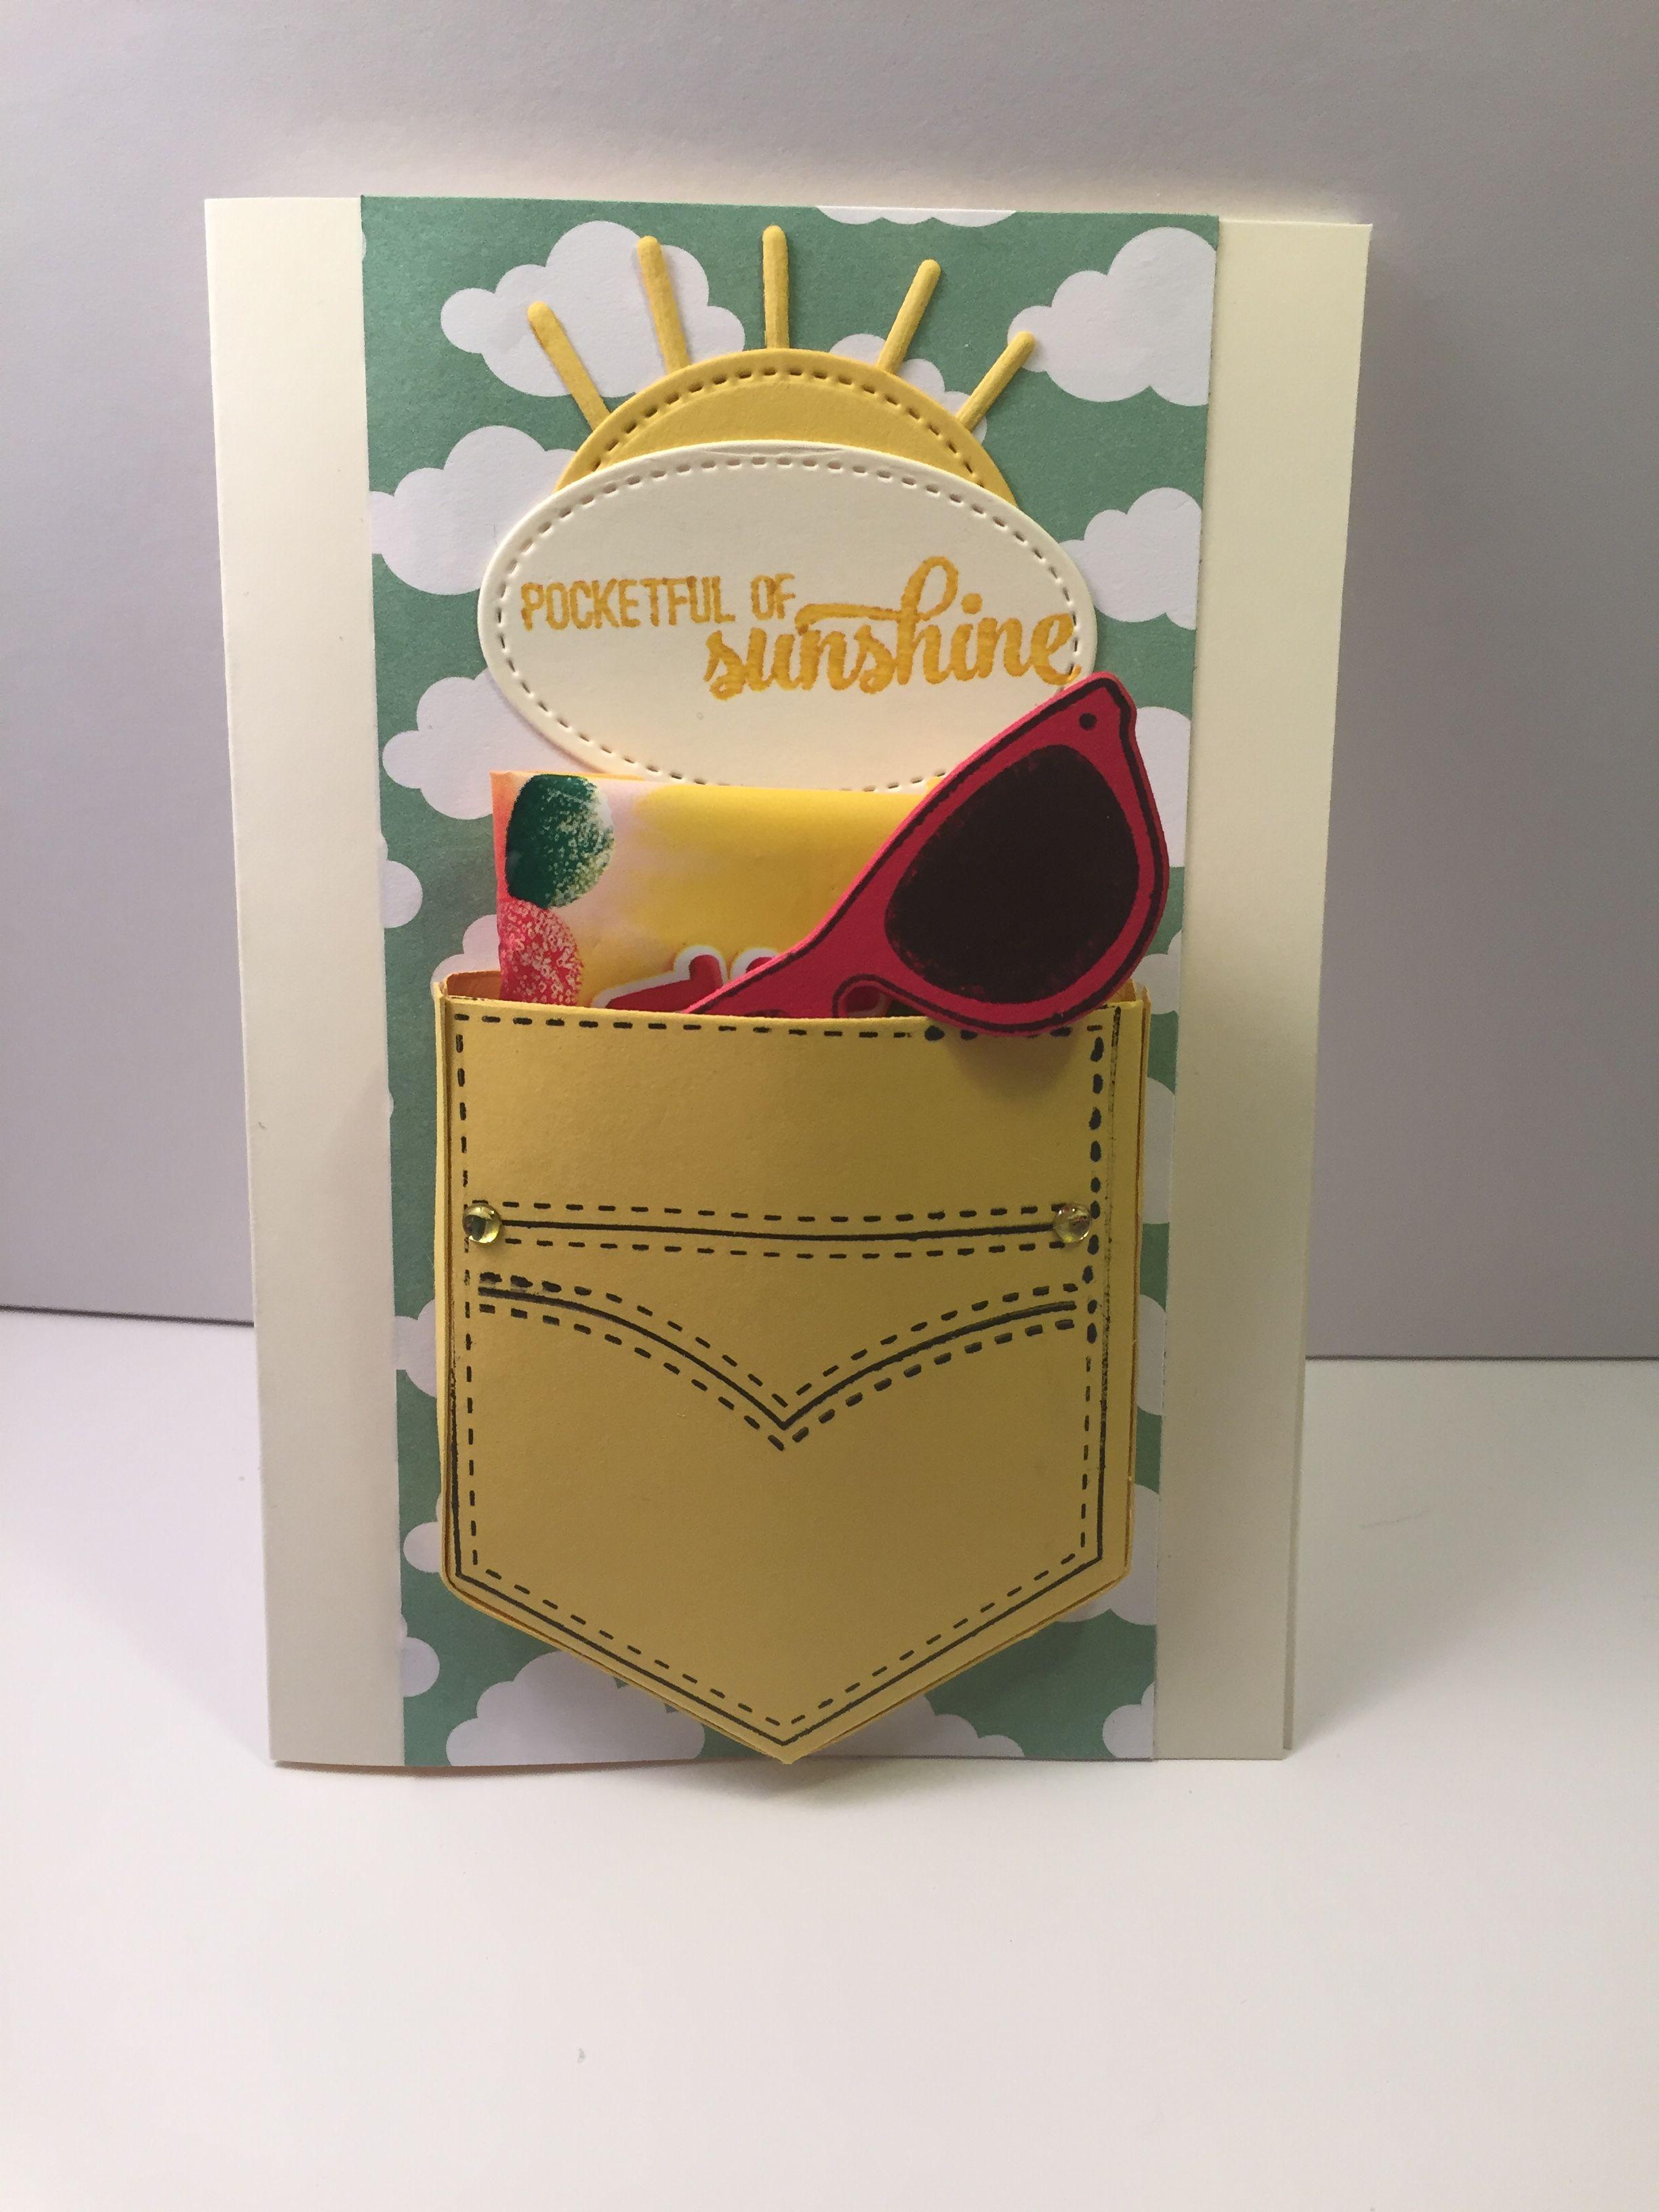 Stampin up pocketful of sunshine pocketful of sunshine bundle stampin up pocketful of sunshine pop up cards cool cards diy cards m4hsunfo